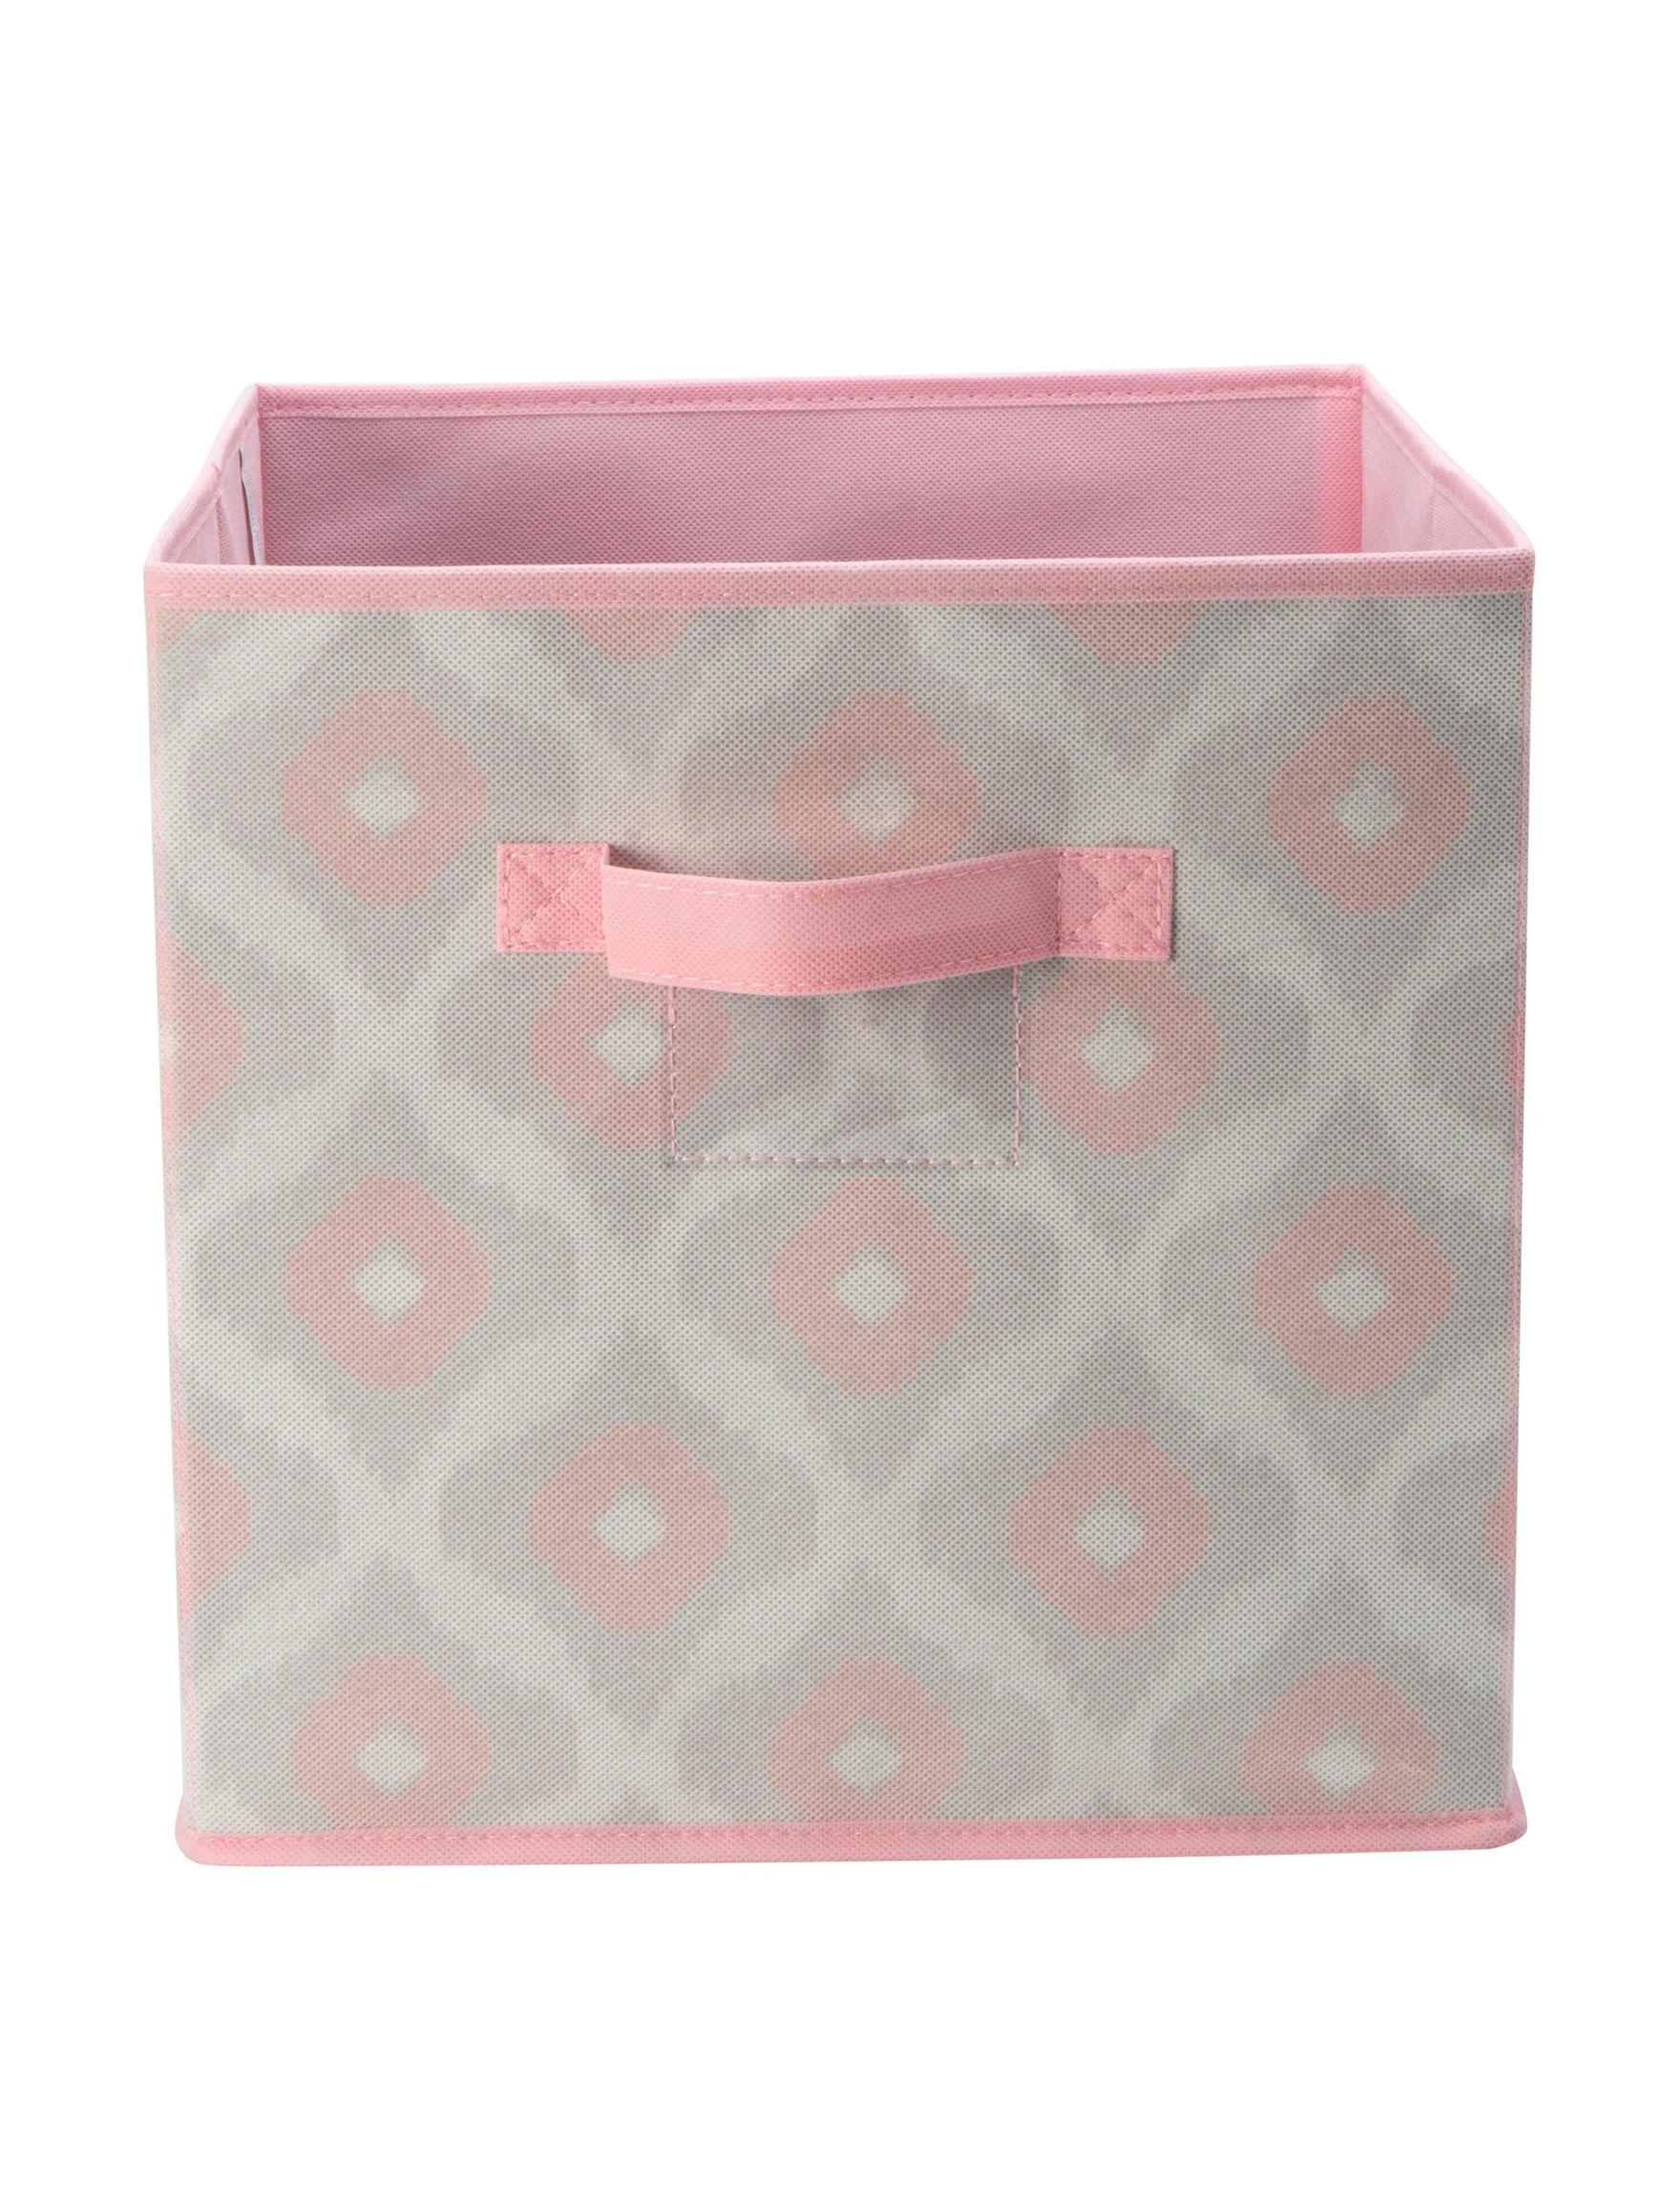 Macbeth Collection Grey / Pink Storage & Organization